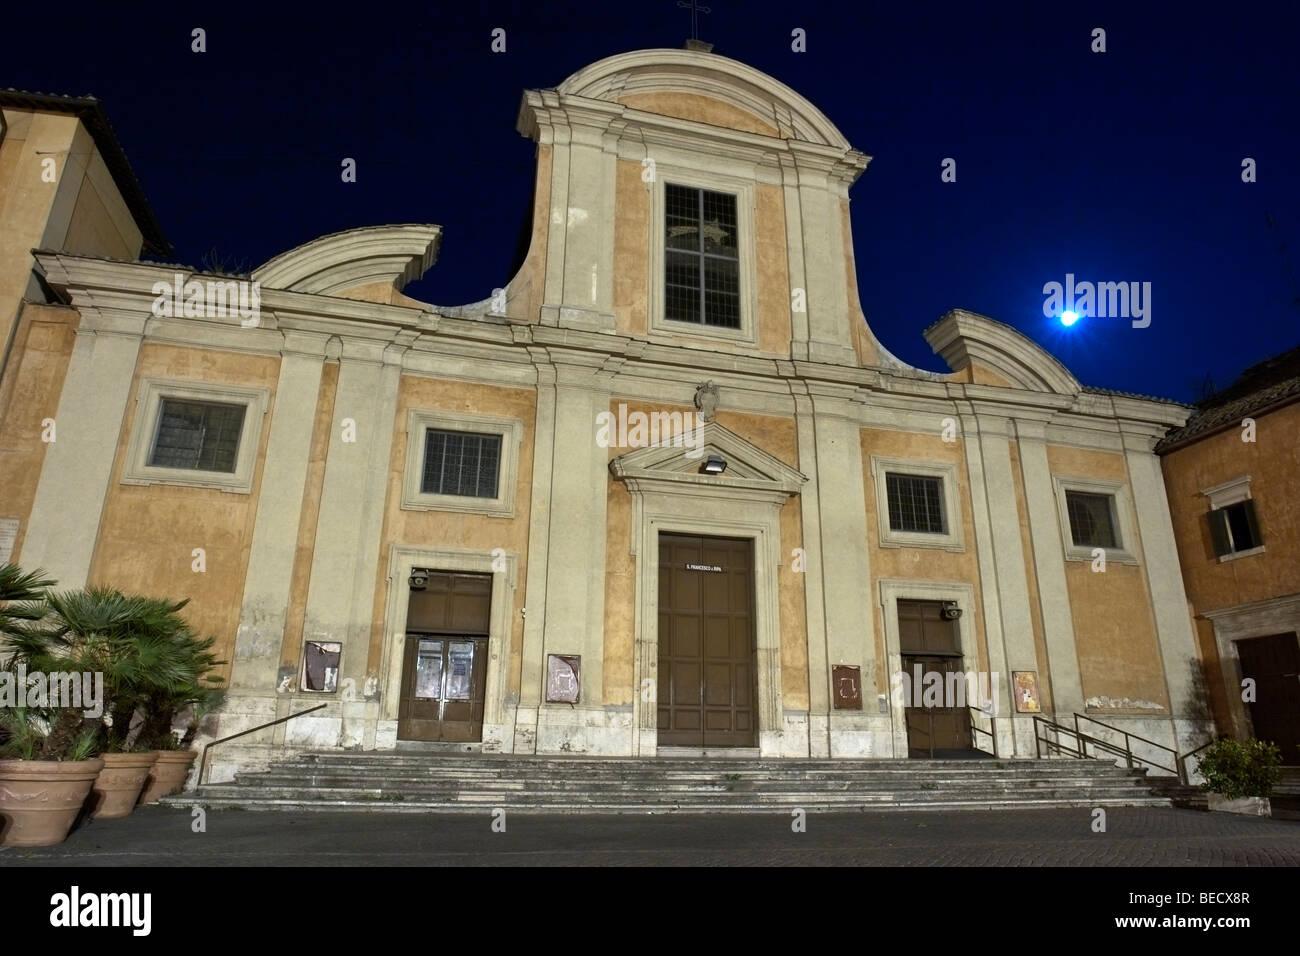 Rome, Italy. Chiesa San Francesco a Ripa, in the Trastevere ward, by night. - Stock Image